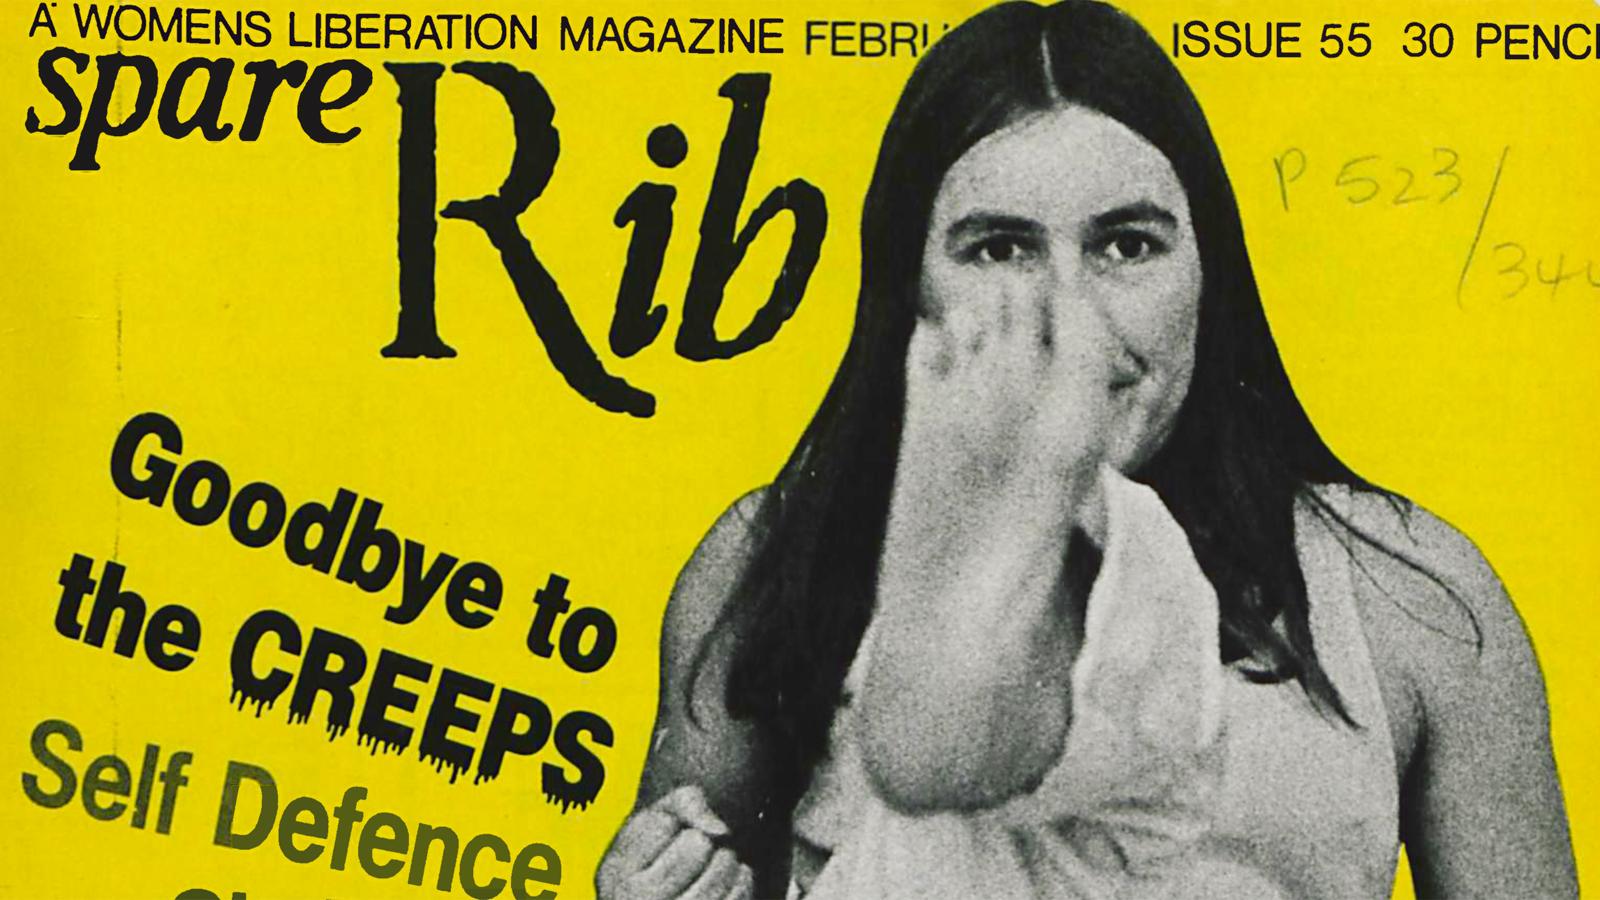 Spare Rib and the underground press